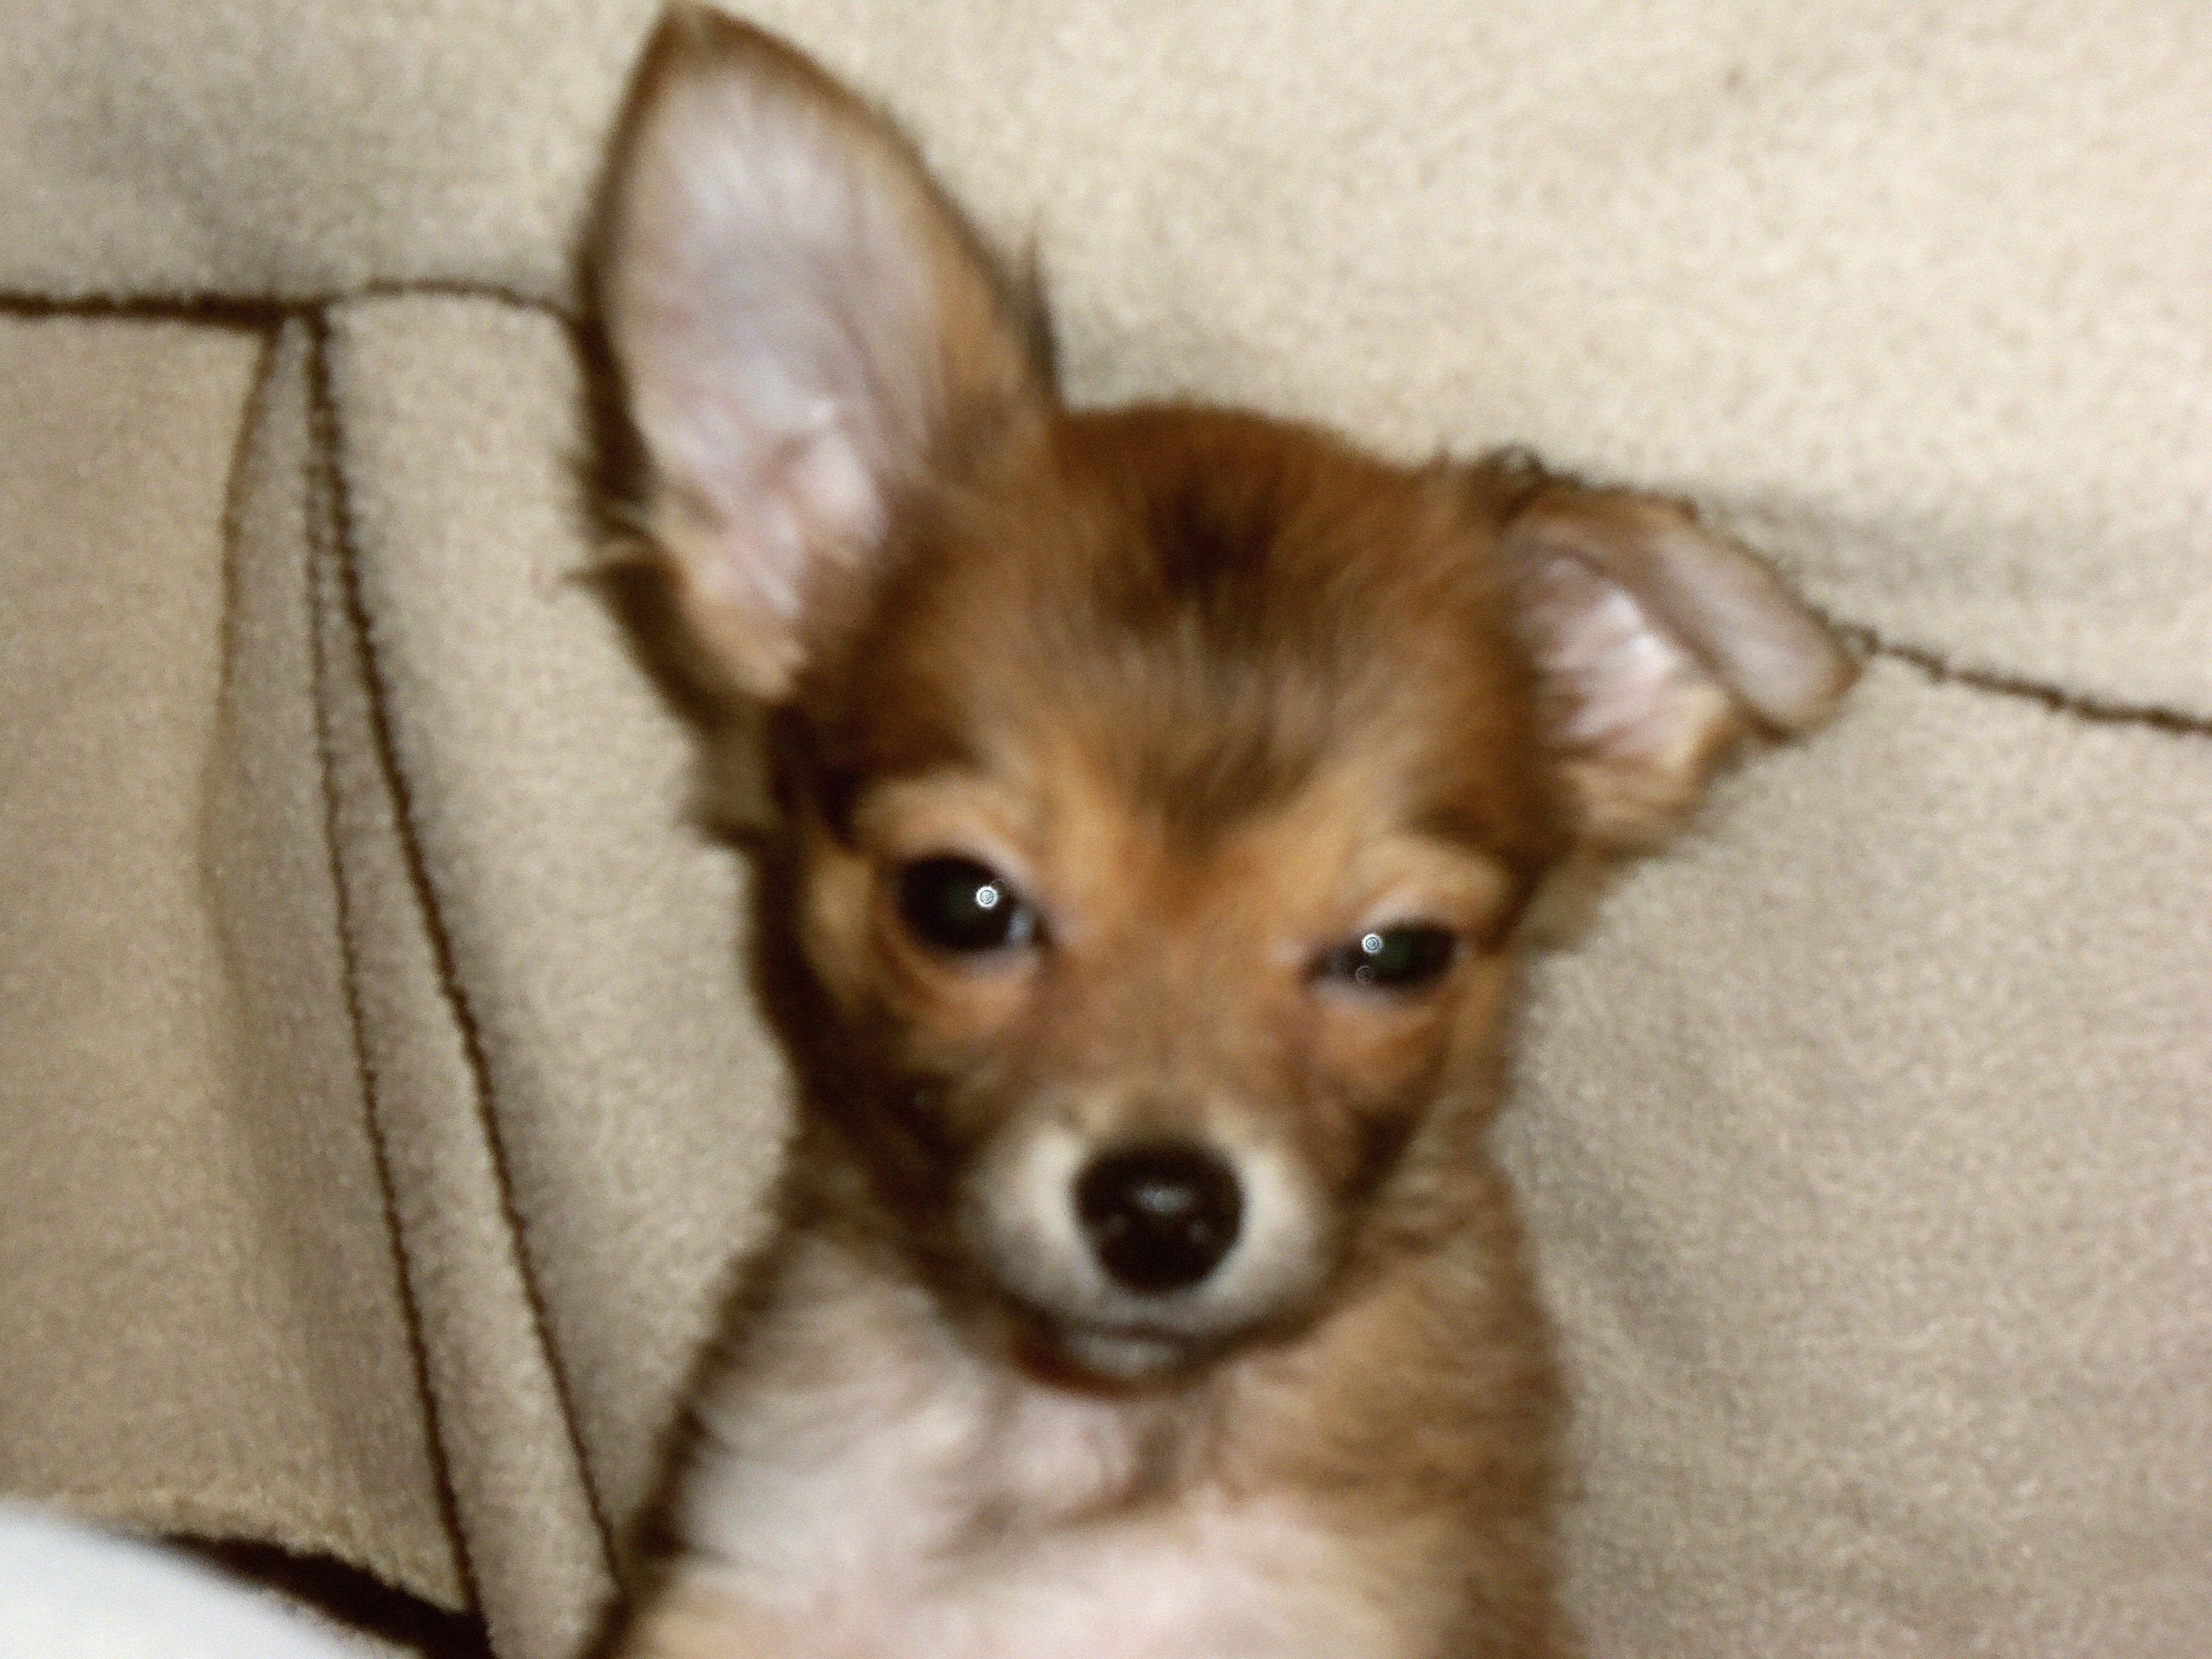 so   s l e e p y....                  My Lil Rudy when he was a baby.